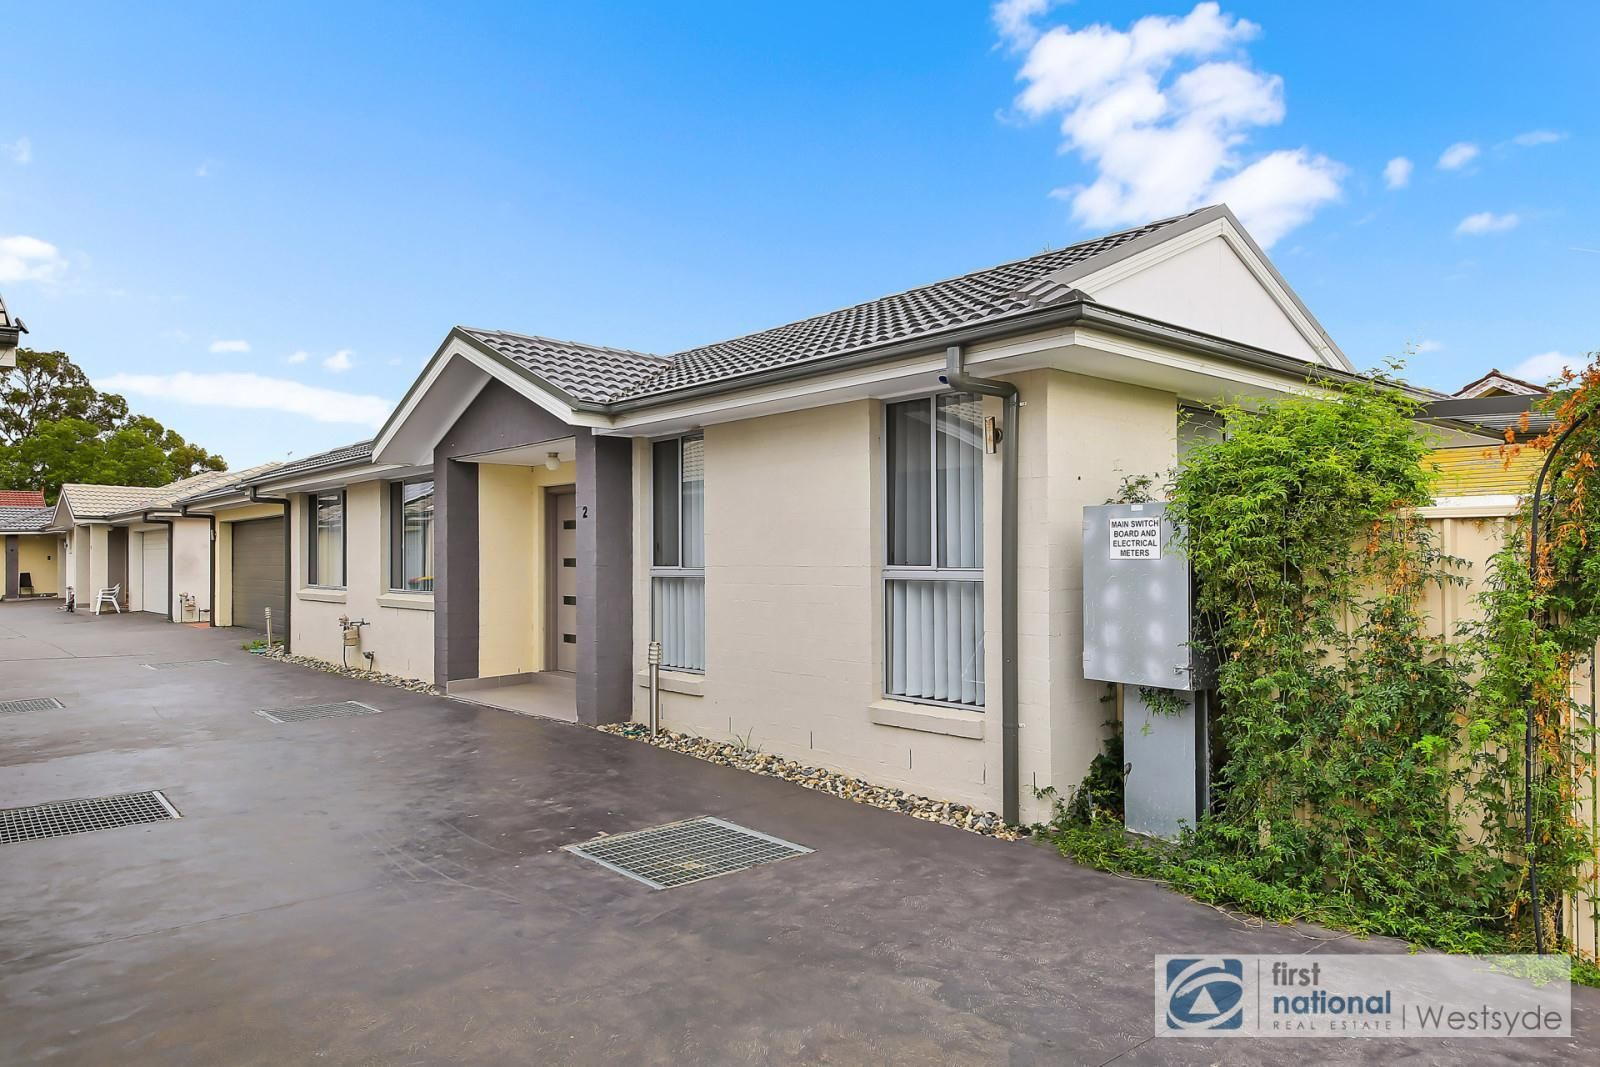 2/56 Tungarra Road, Girraween NSW 2145, Image 0